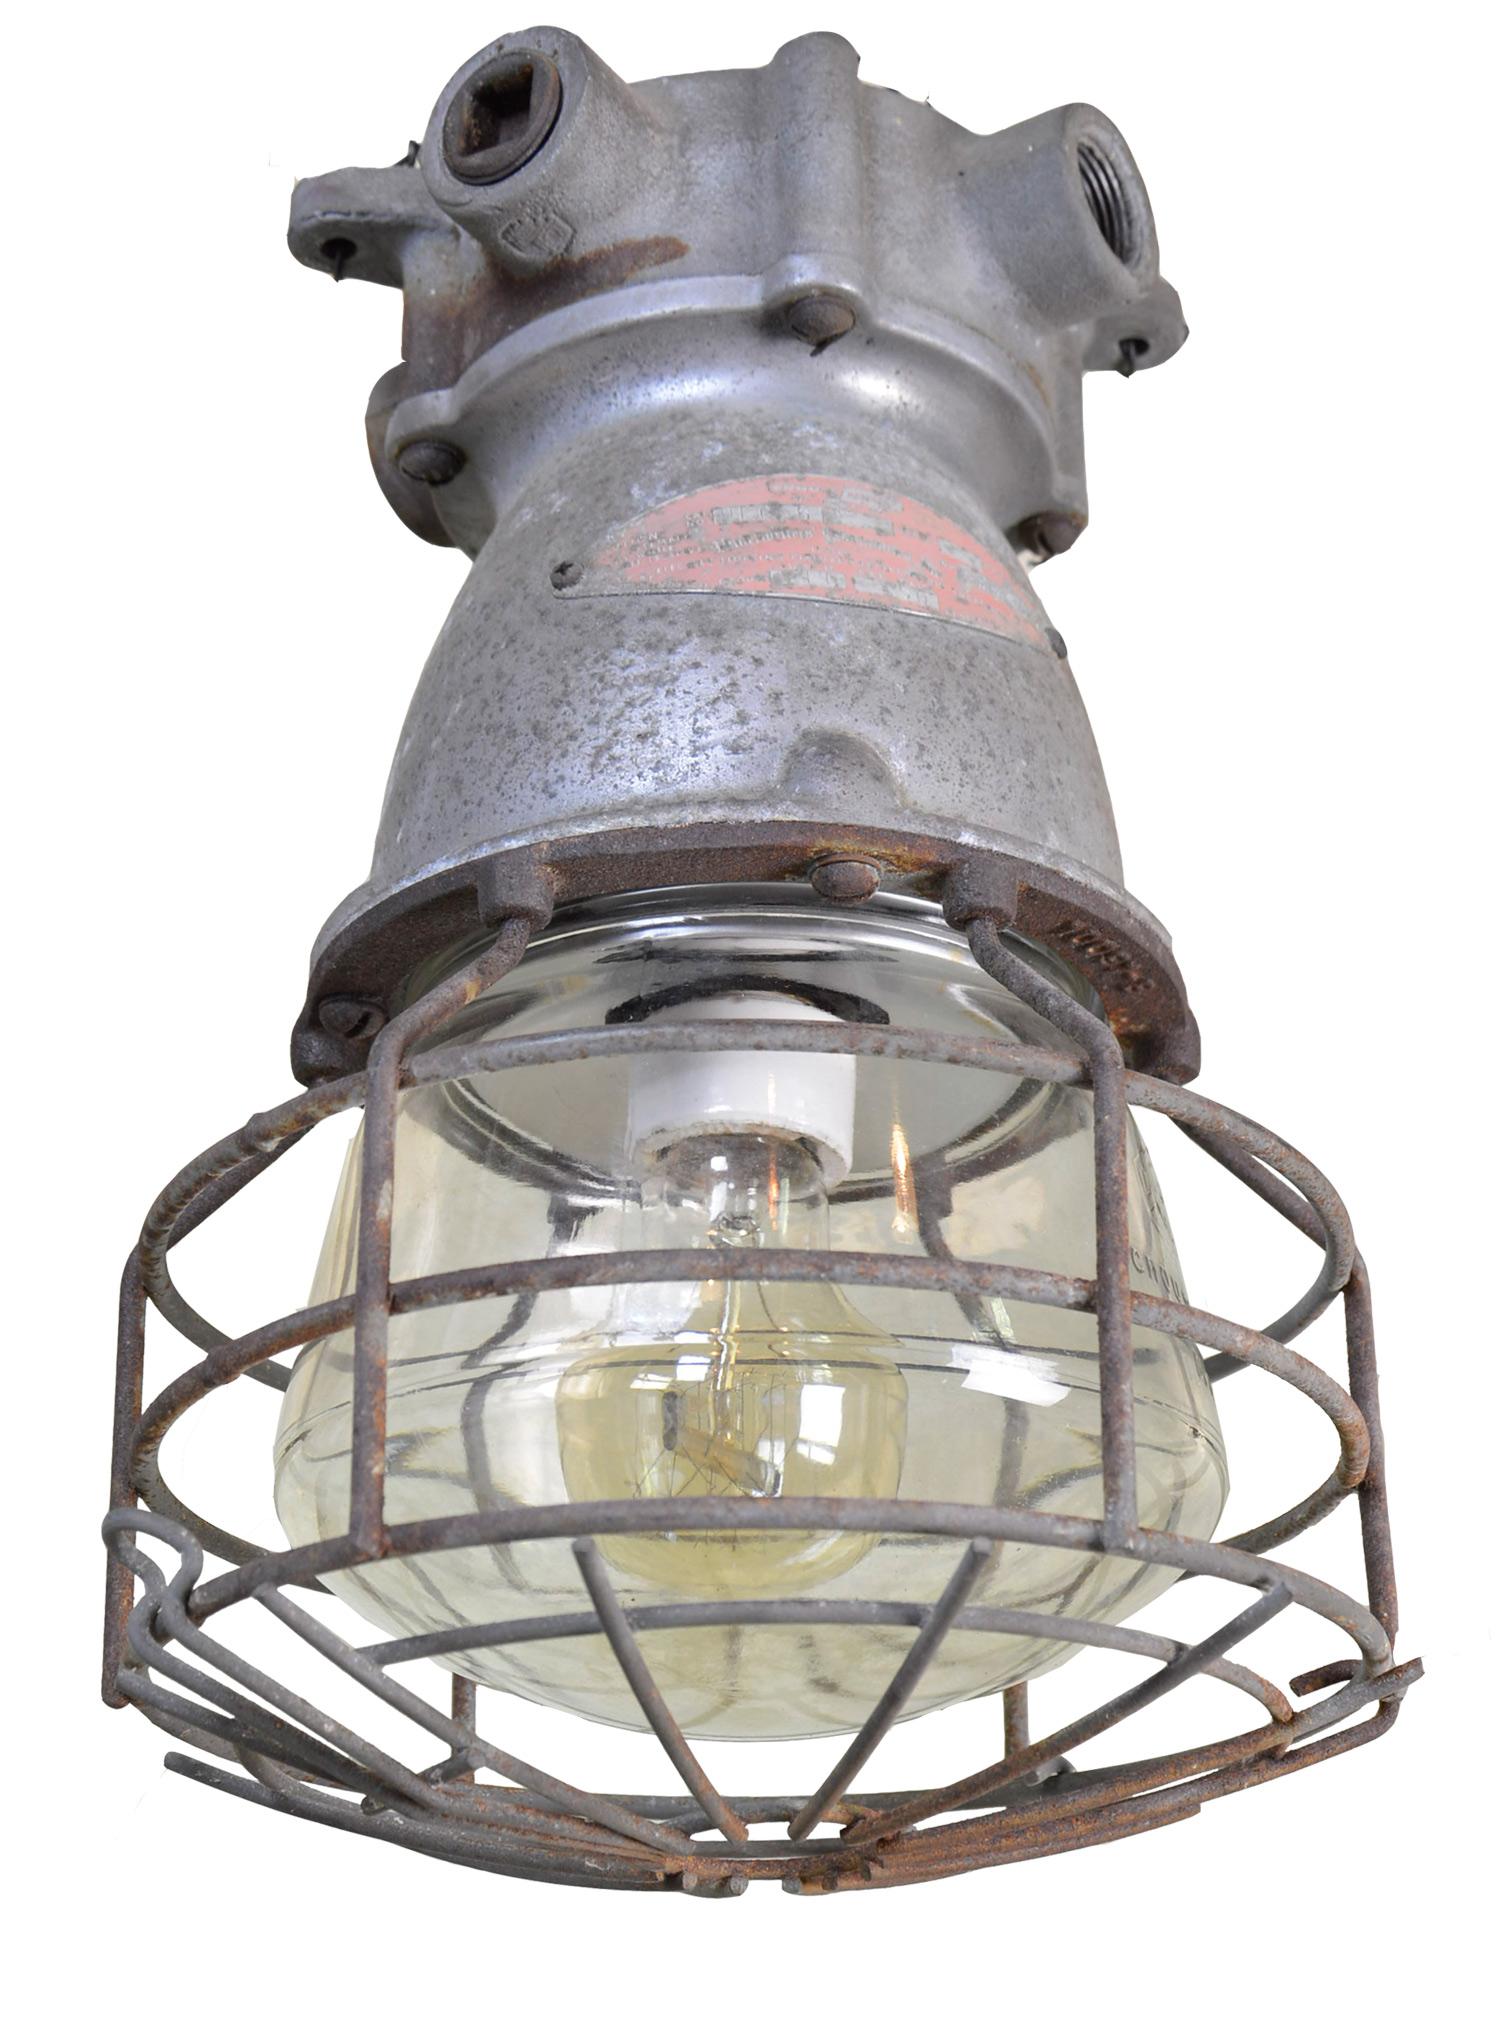 46279-galvanized-pendant-with-cage-Full-under.jpg